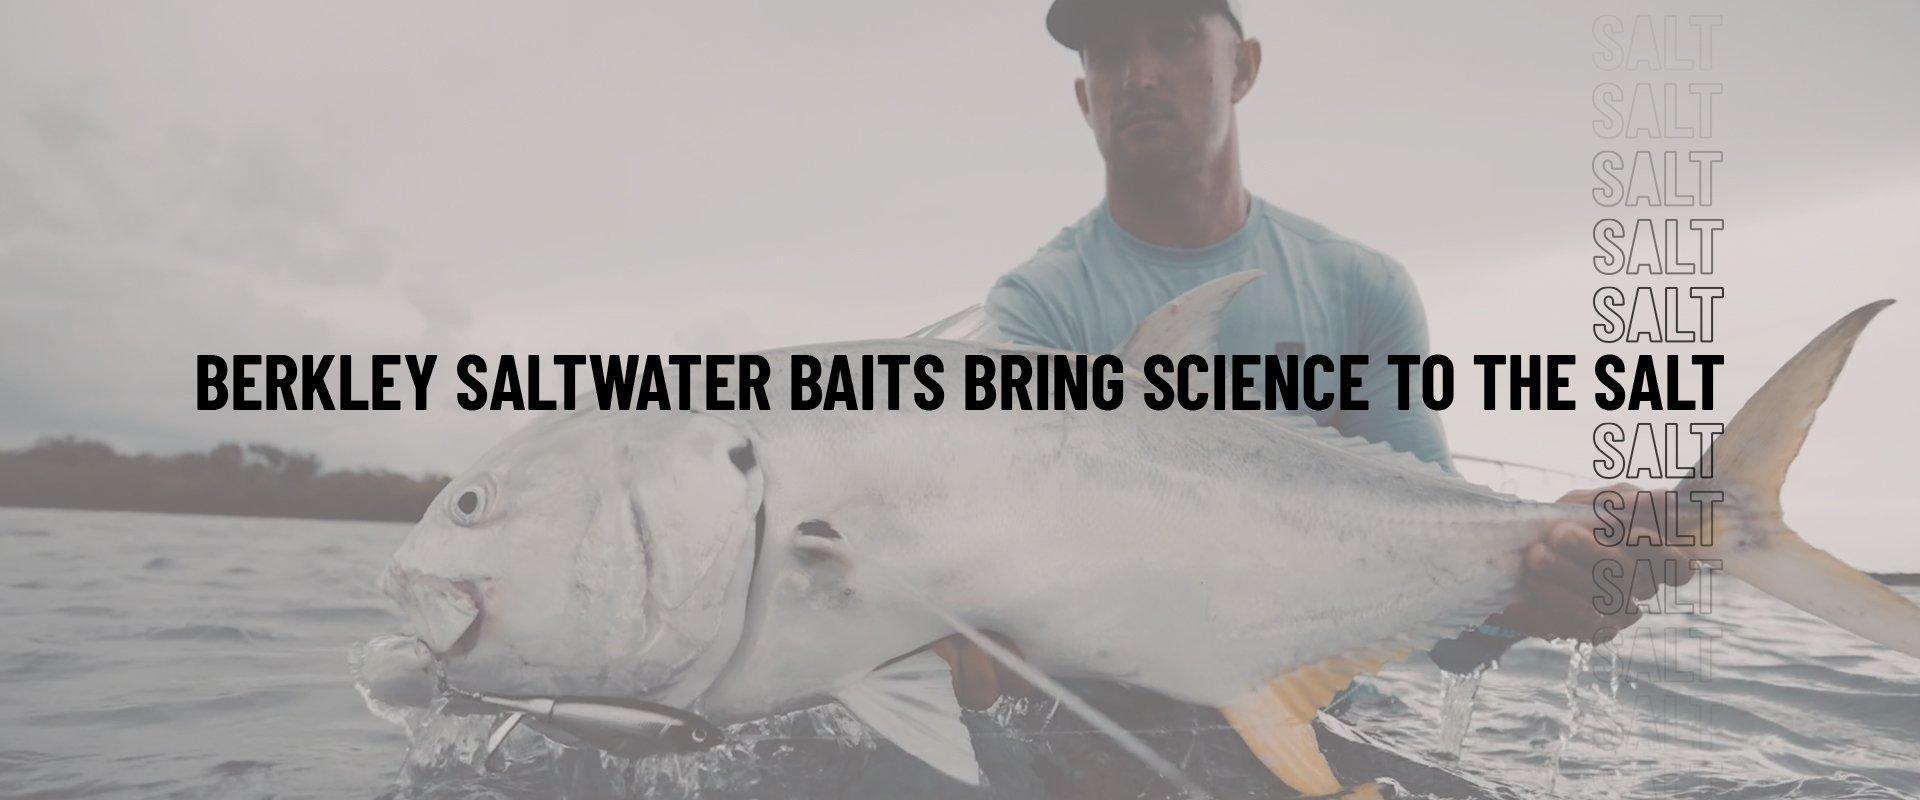 Berkley Saltwater Baits bring science to salt